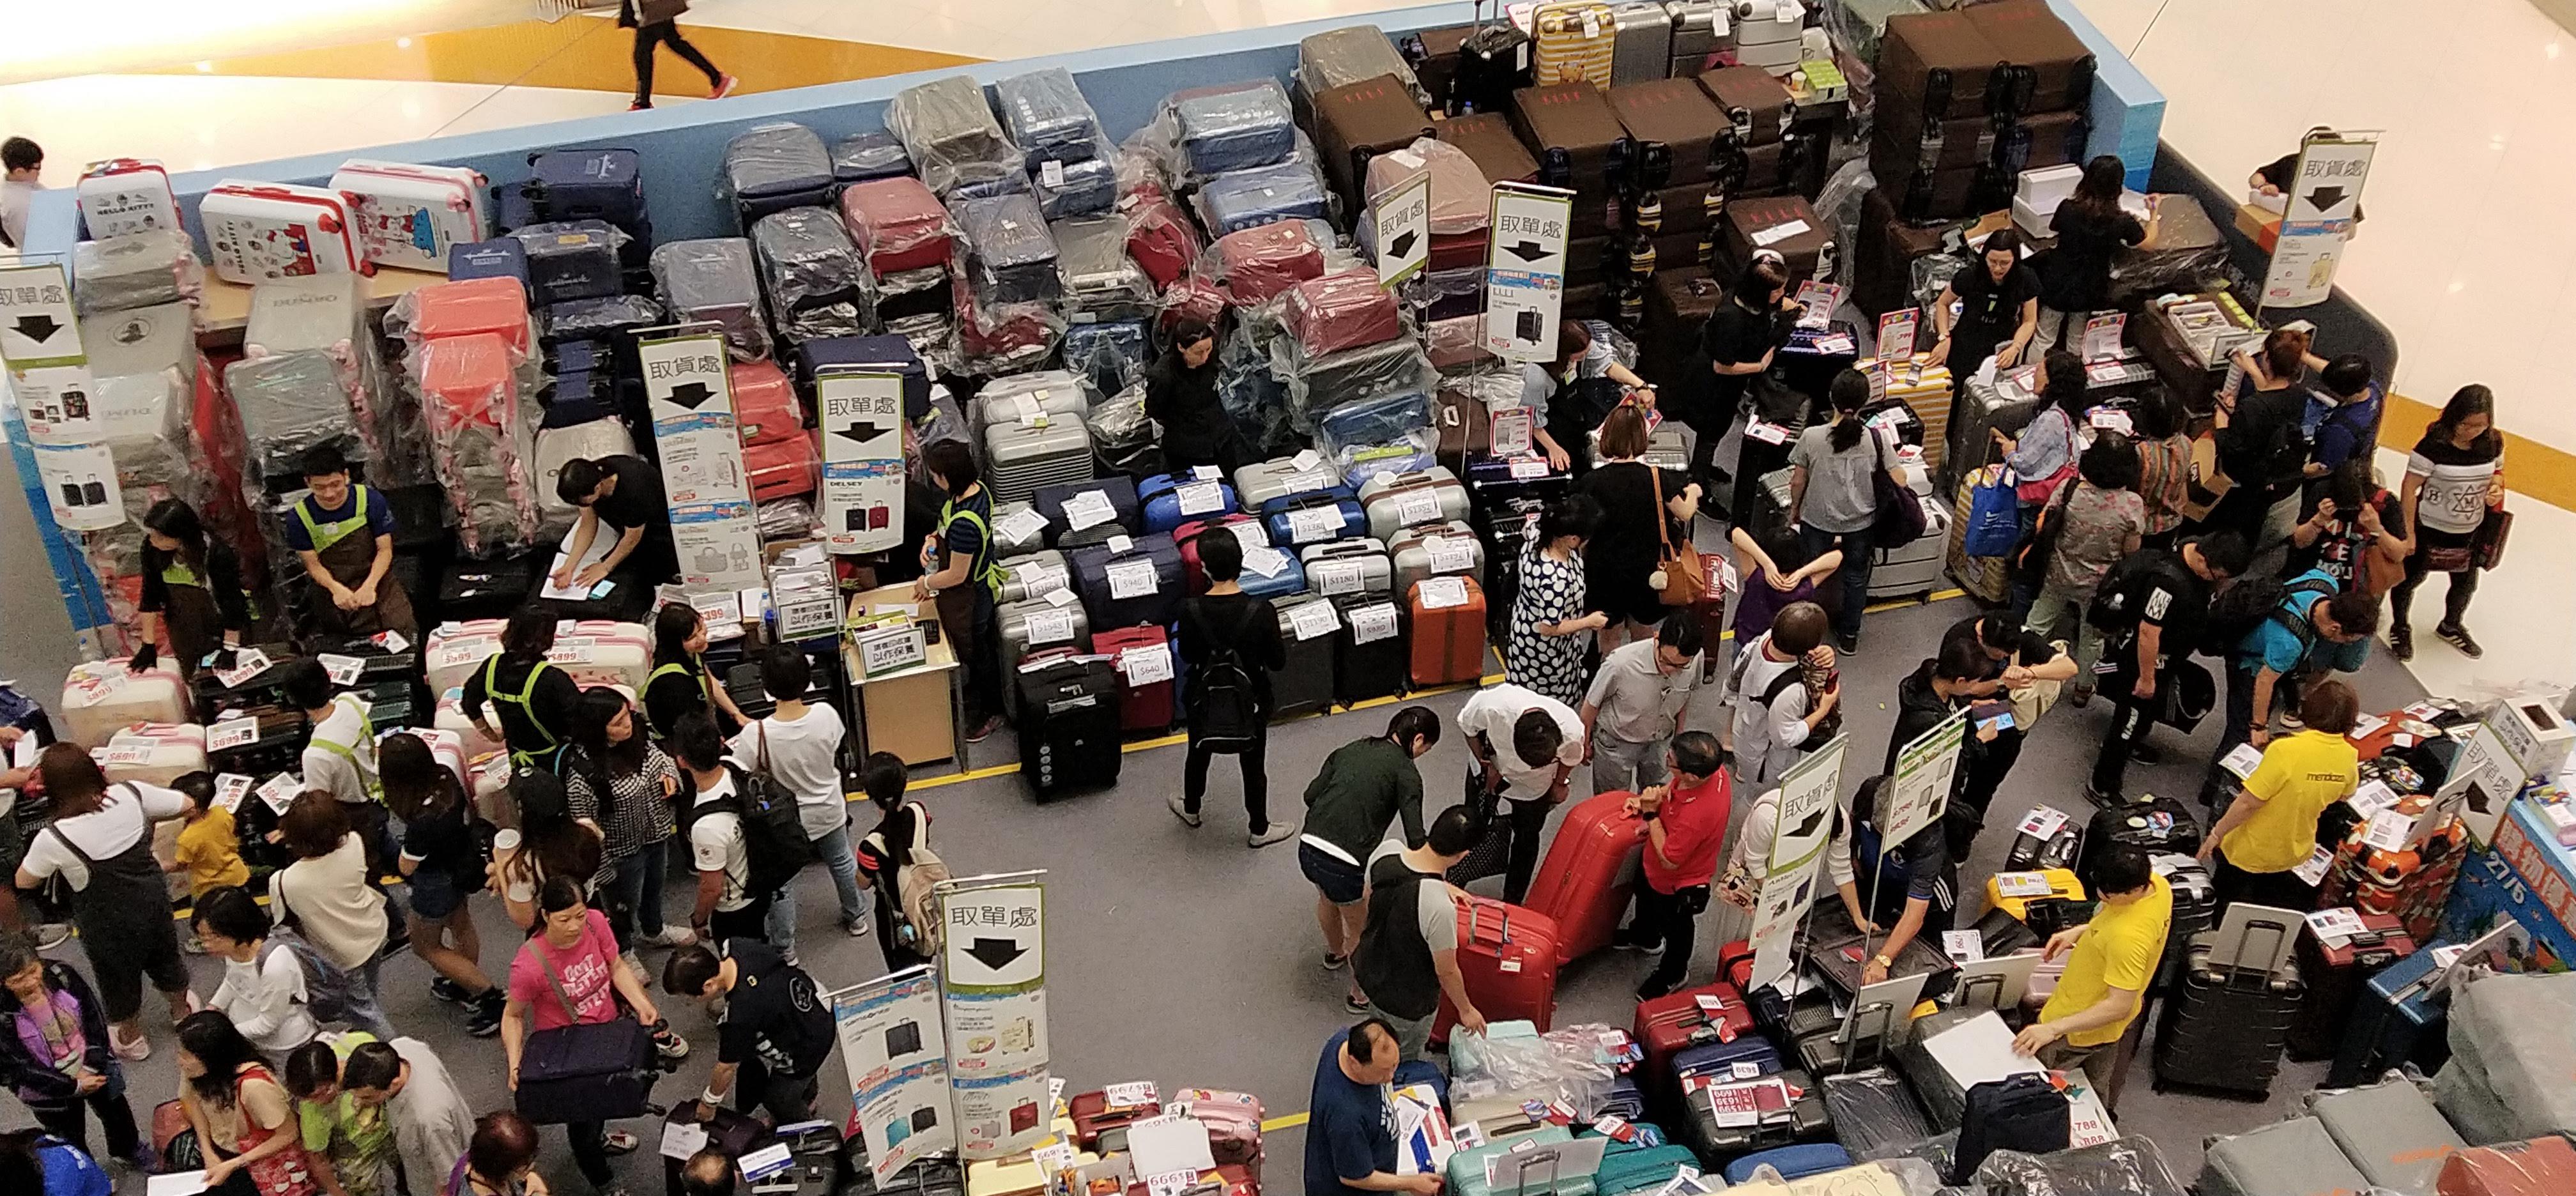 shopper buying suitcase, shopkeepers selling suitcase